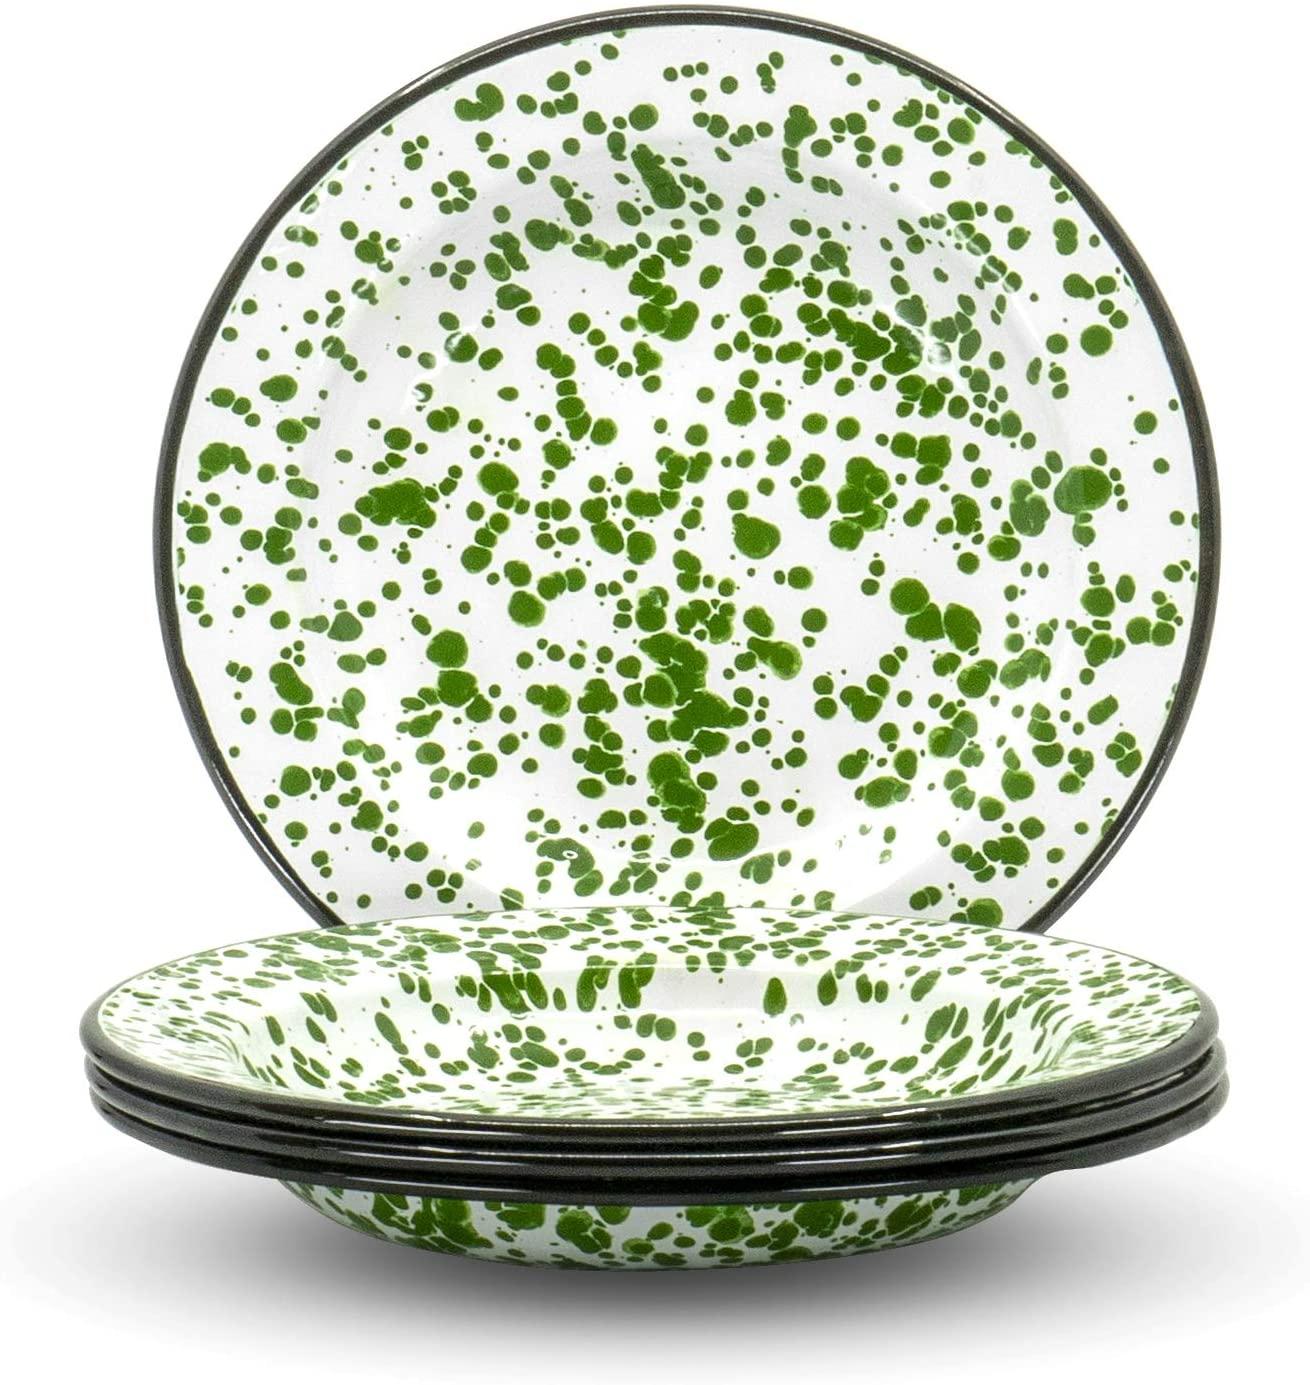 Red Co. Enamelware Classic 8 inch Round Flat Salad Plate, Dark Green Marble/Black Rim - Splatter Design - Set of 4